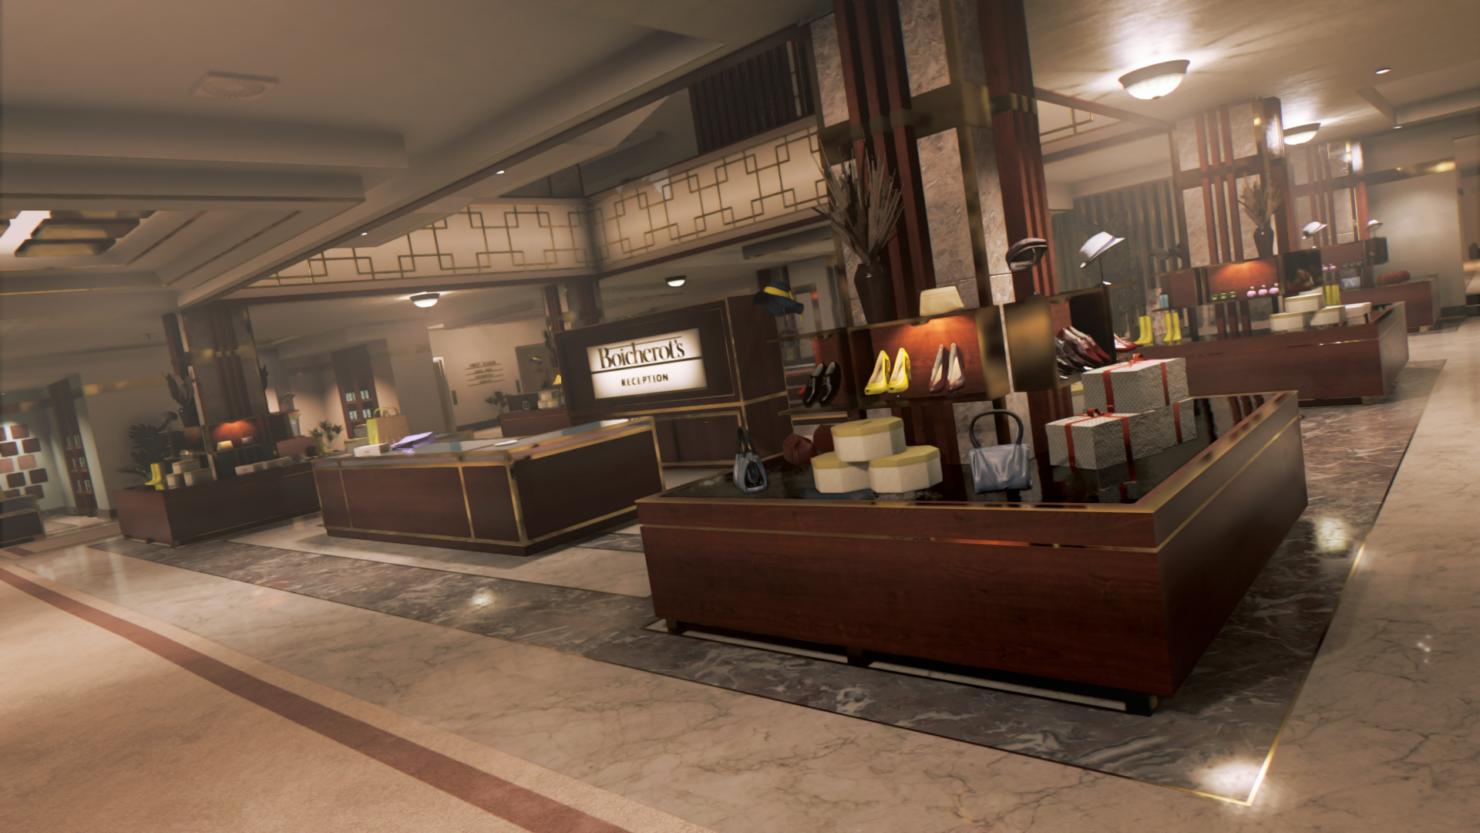 mafia3_dlc2_stones_unturned_screenshot_06_environment_boicherots_department_store_interior_lit